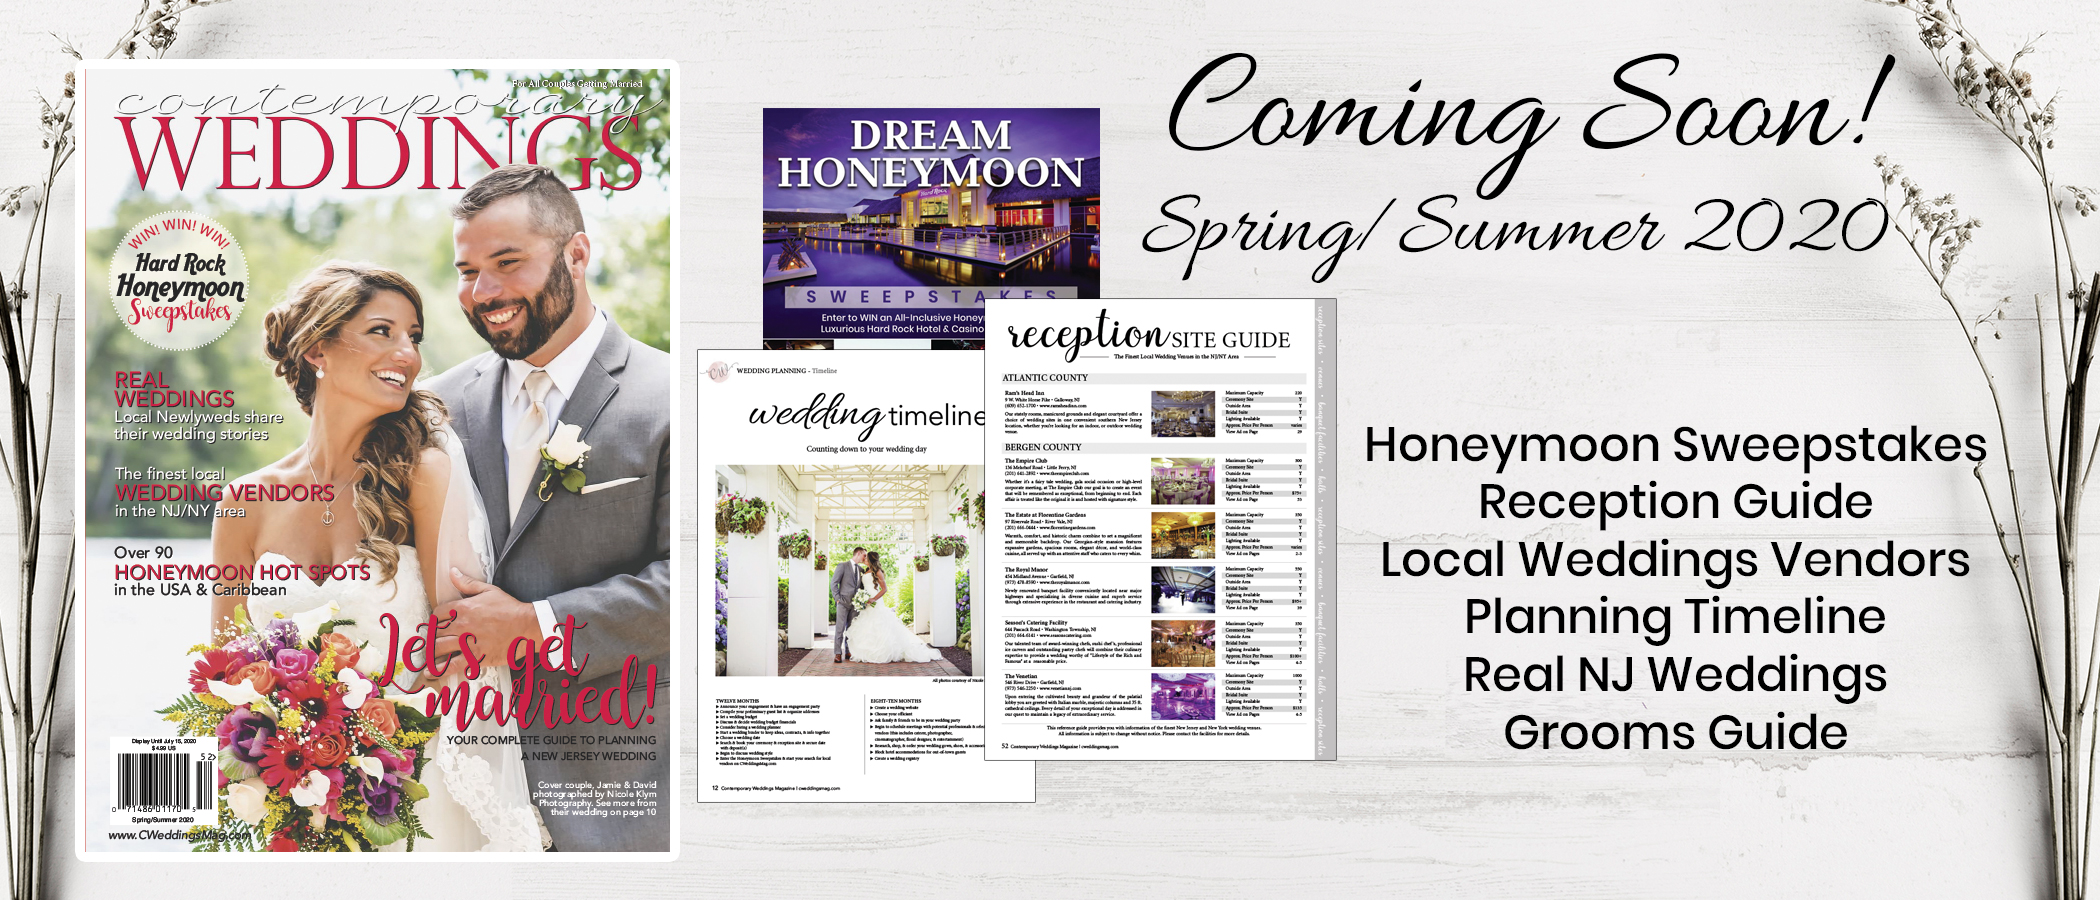 Contemporary Weddings Magazine Spring Summer 2020